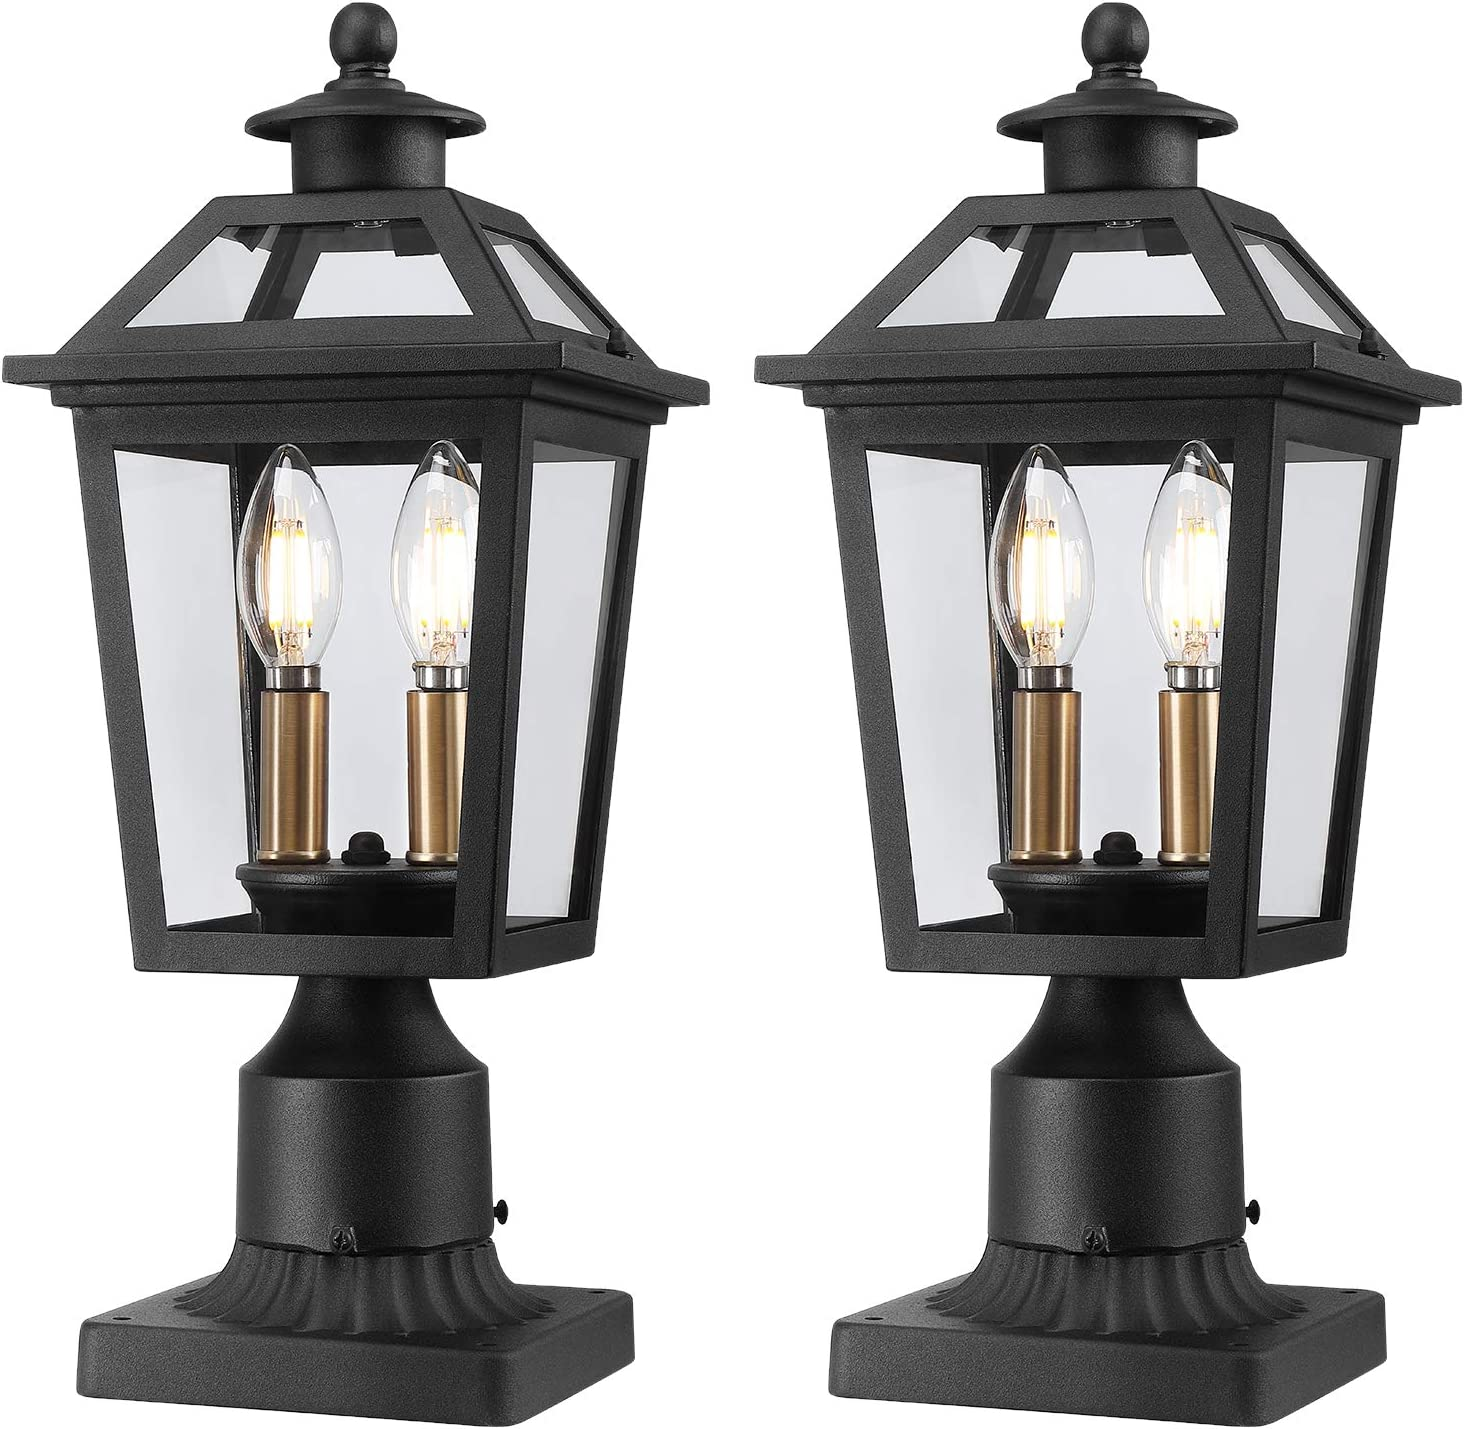 Beionxii Outdoor 40% OFF Cheap Sale Post Lights Lantern Challenge the lowest price of Japan Pillar Ligh Exterior